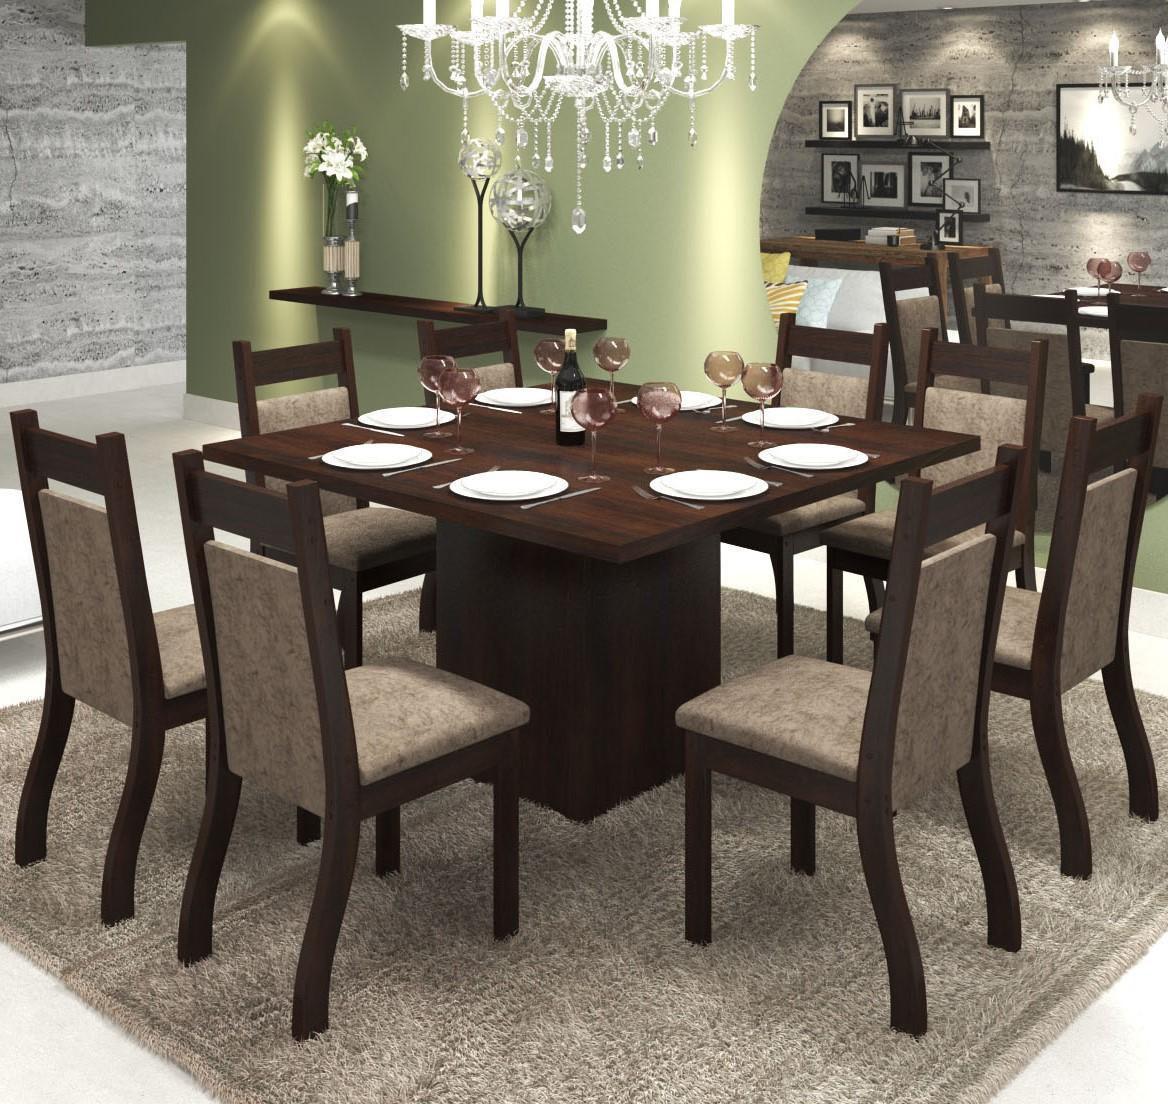 Conjunto de mesa para sala de jantar olinda com 8 cadeiras for Sala 2 conjunto de artes escenicas